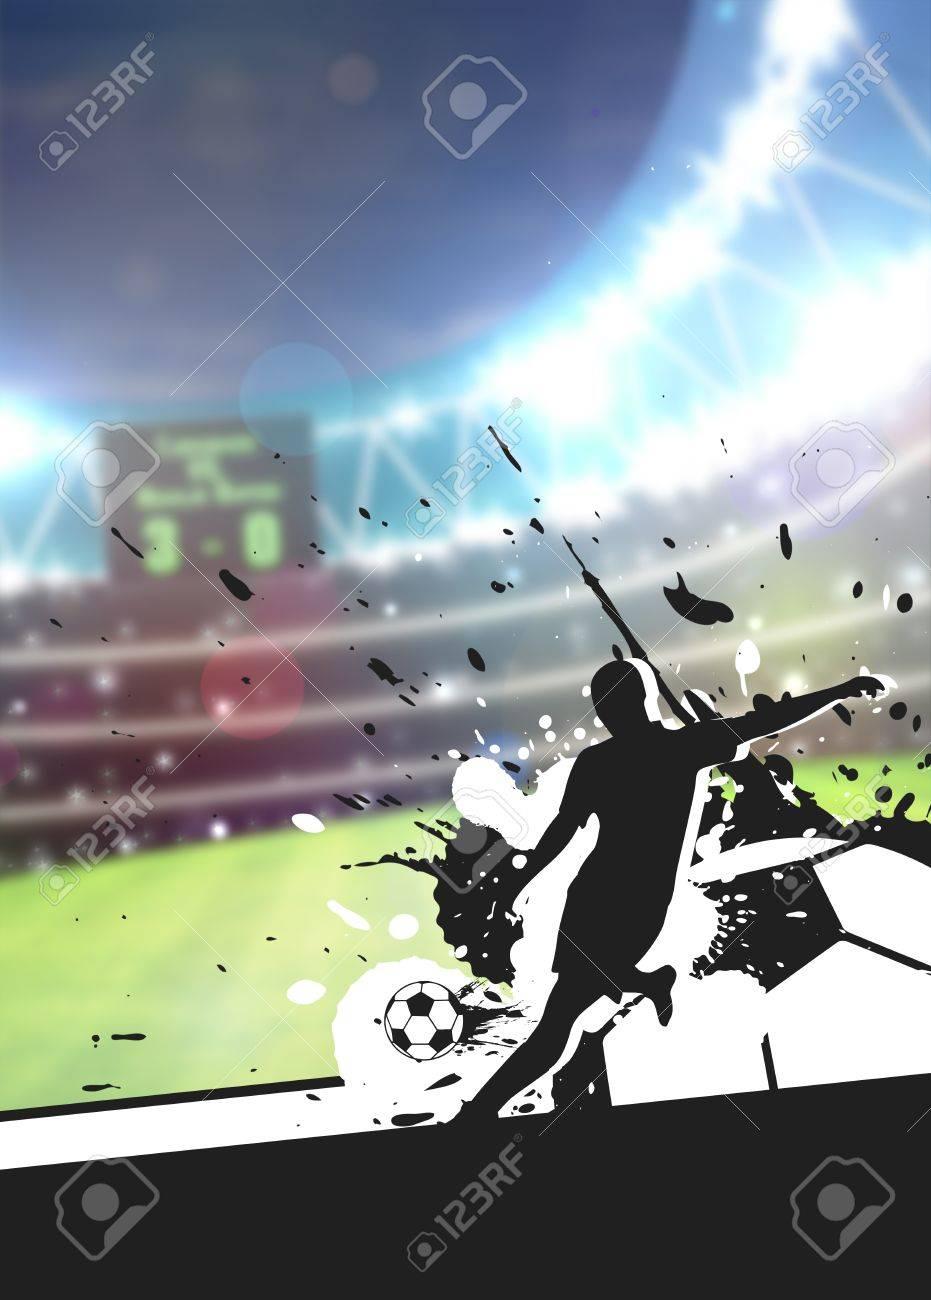 football flyer background